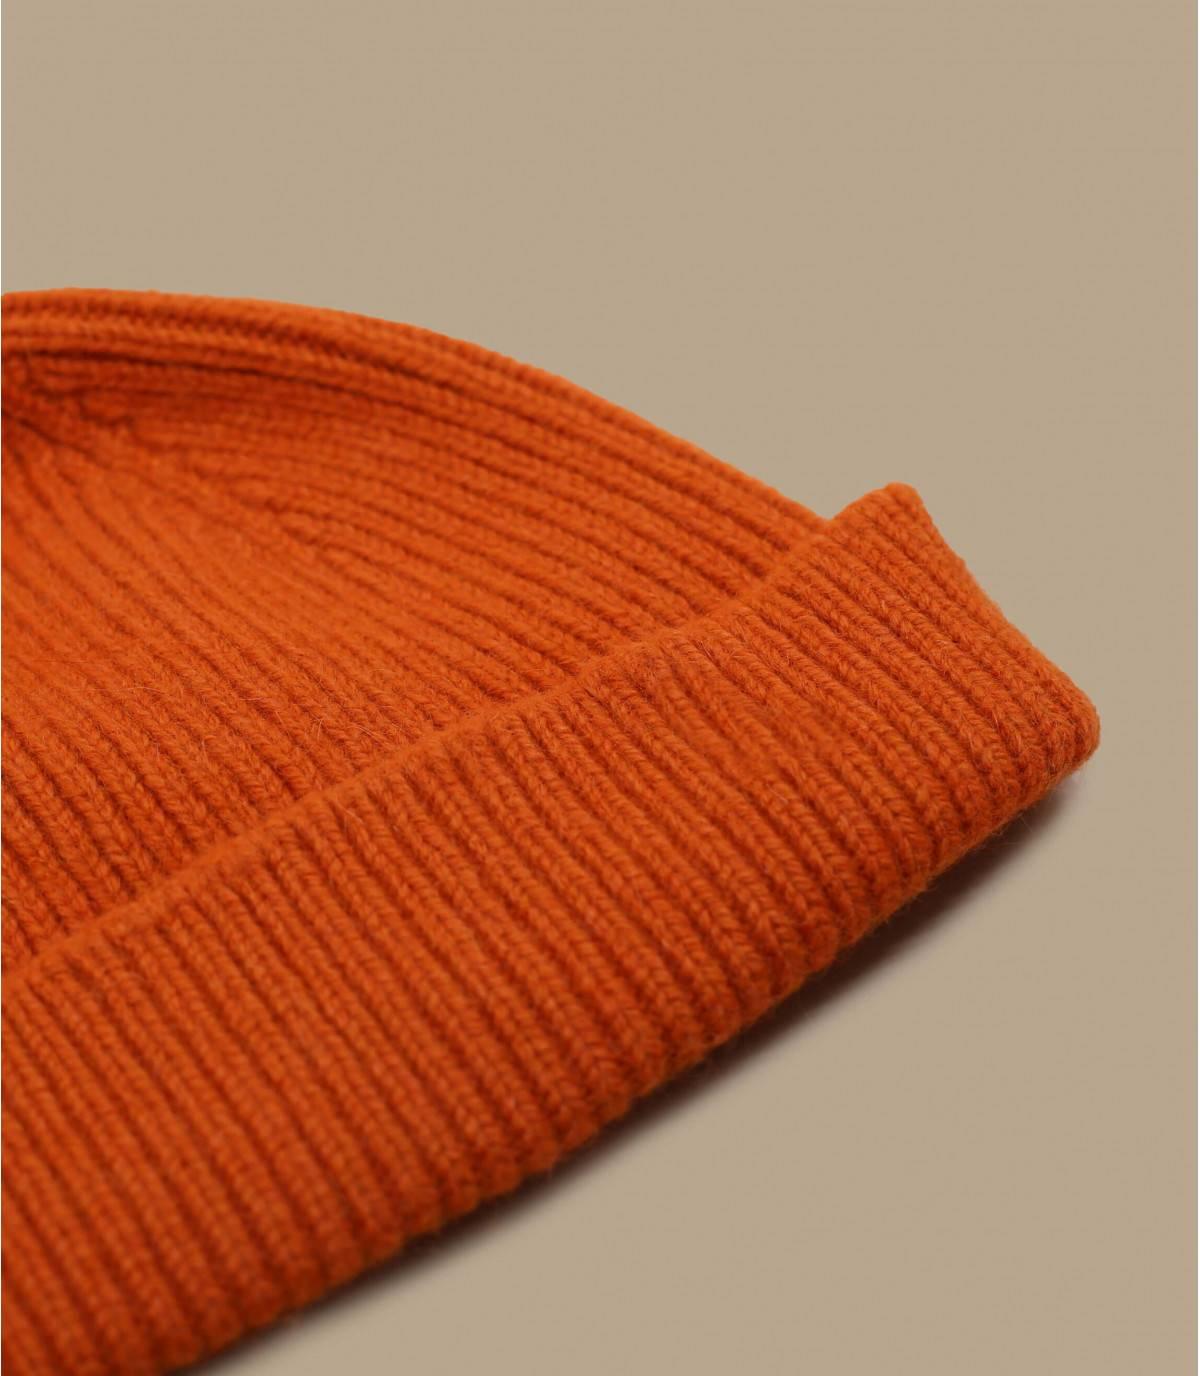 Docker Mütze orange Angorawolle